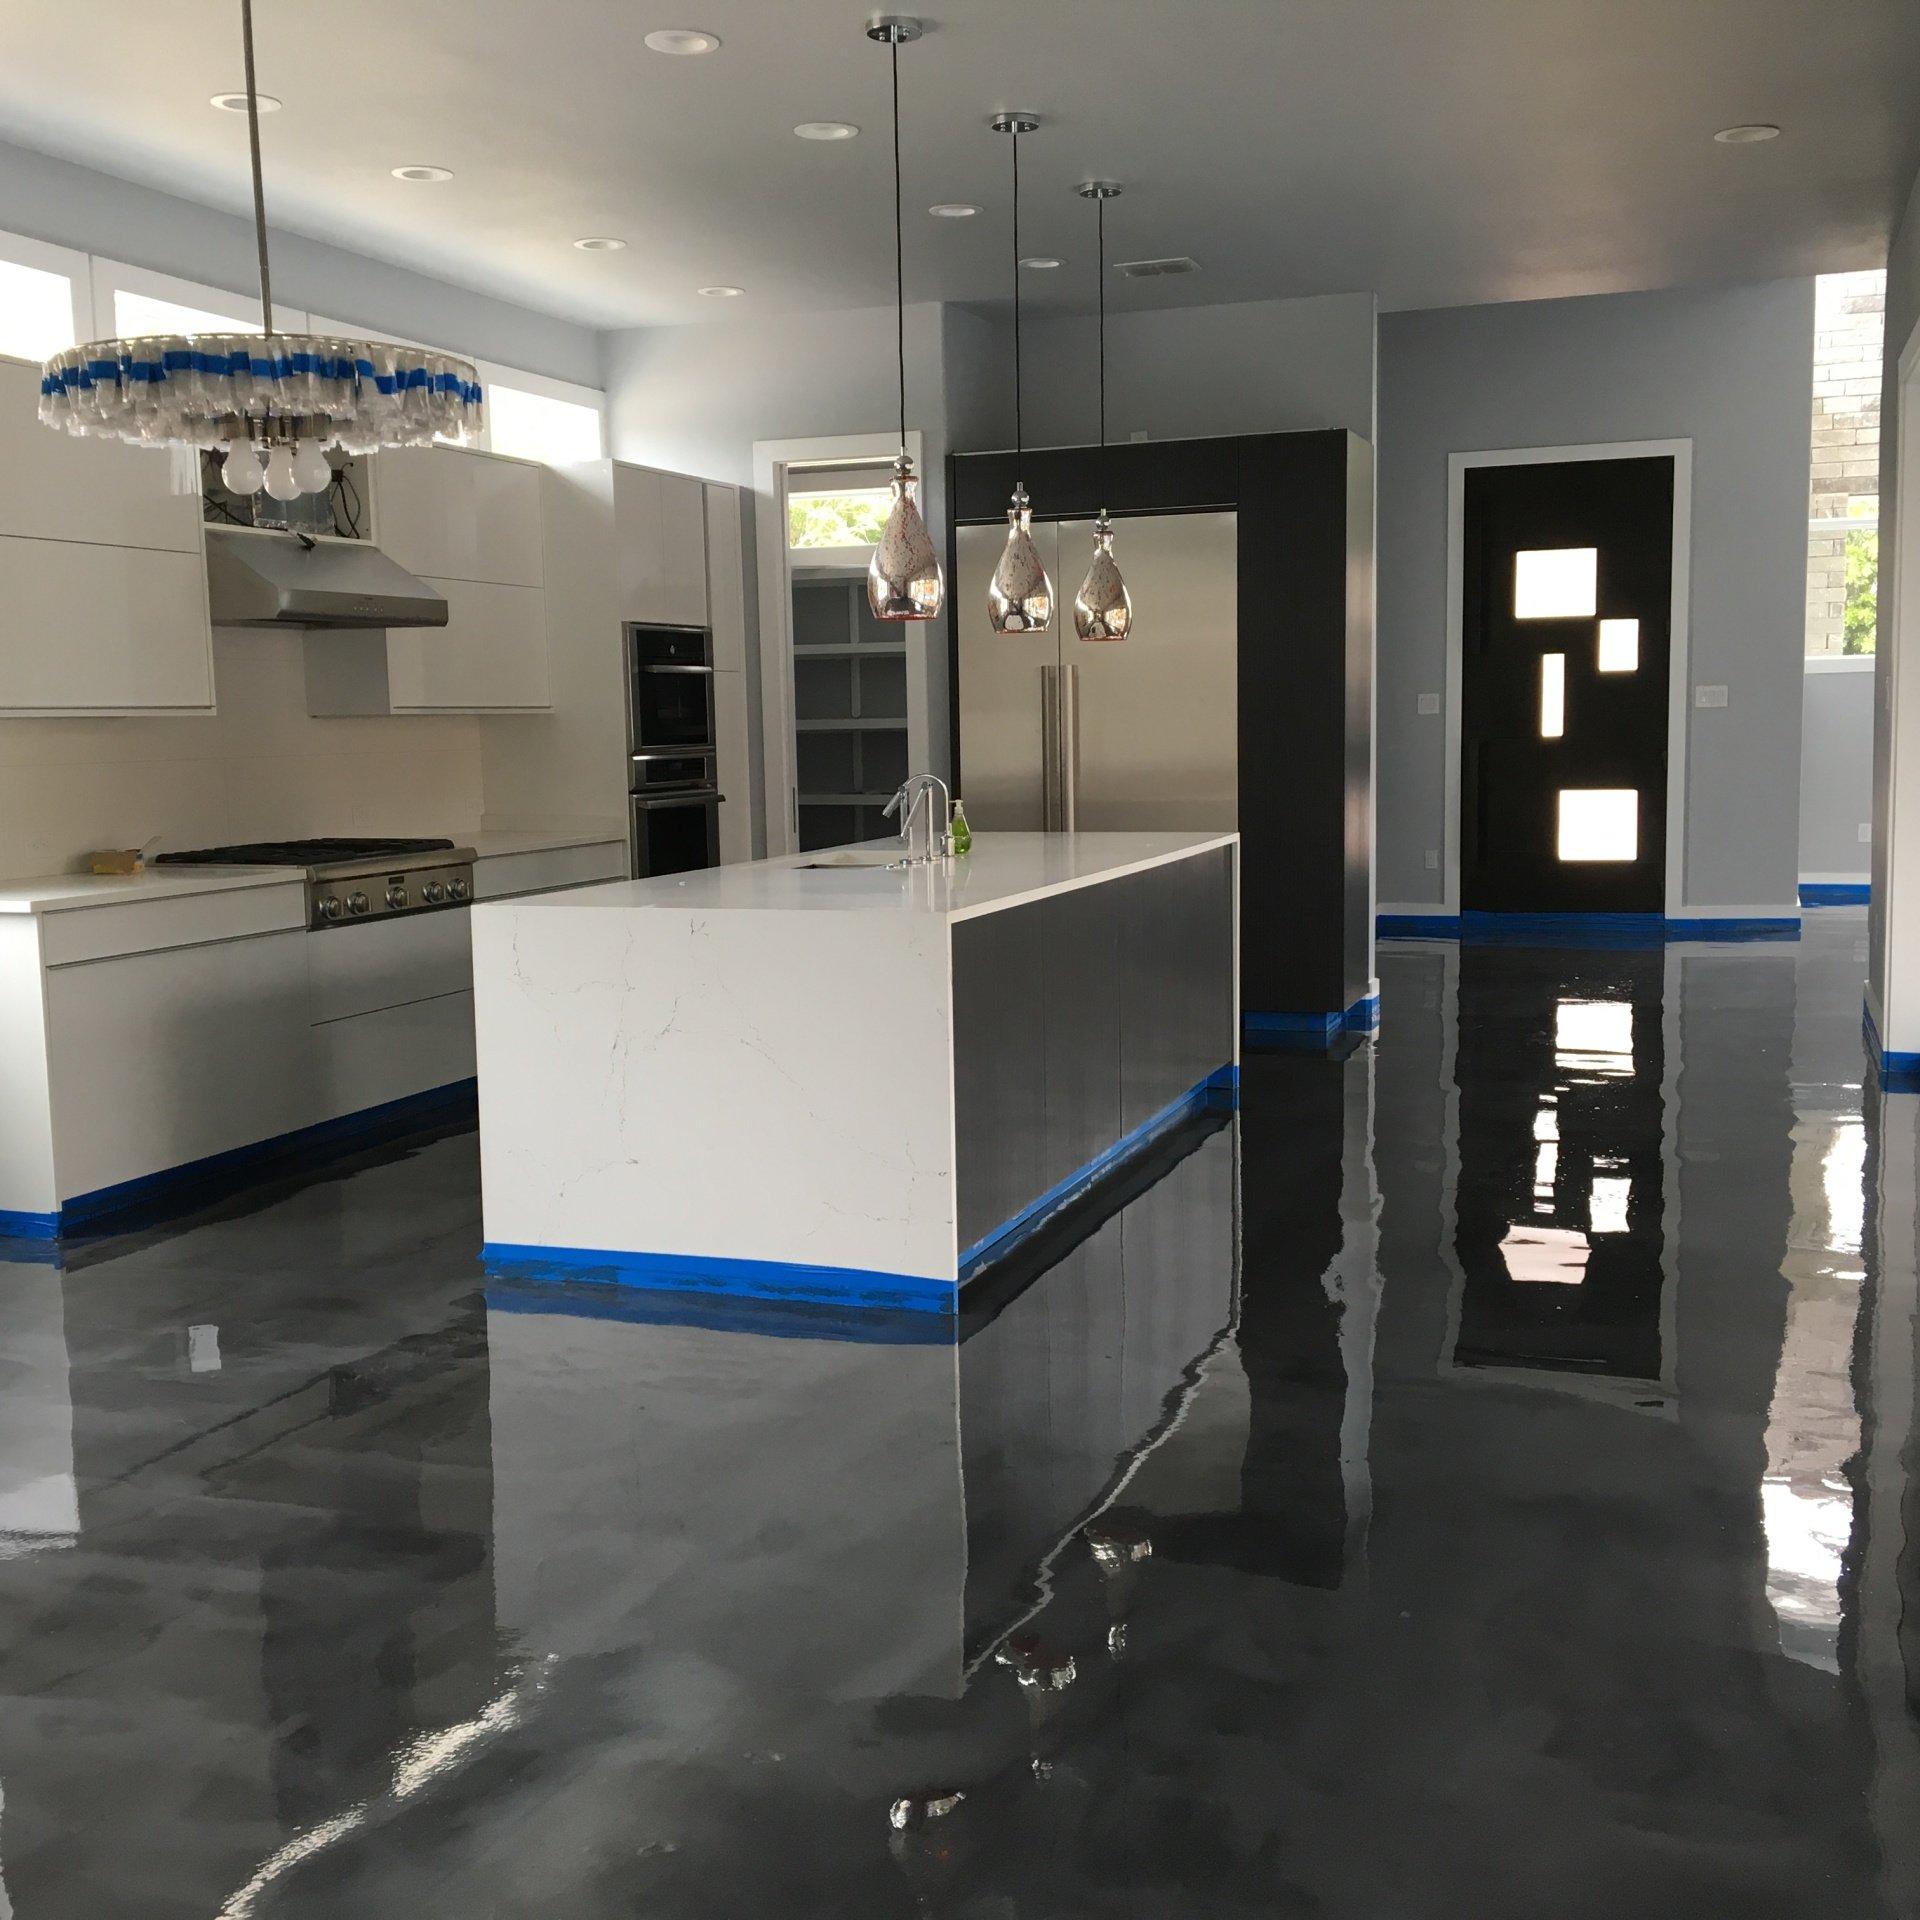 New Garage Flooring: Polyurethane & Epoxy Flooring